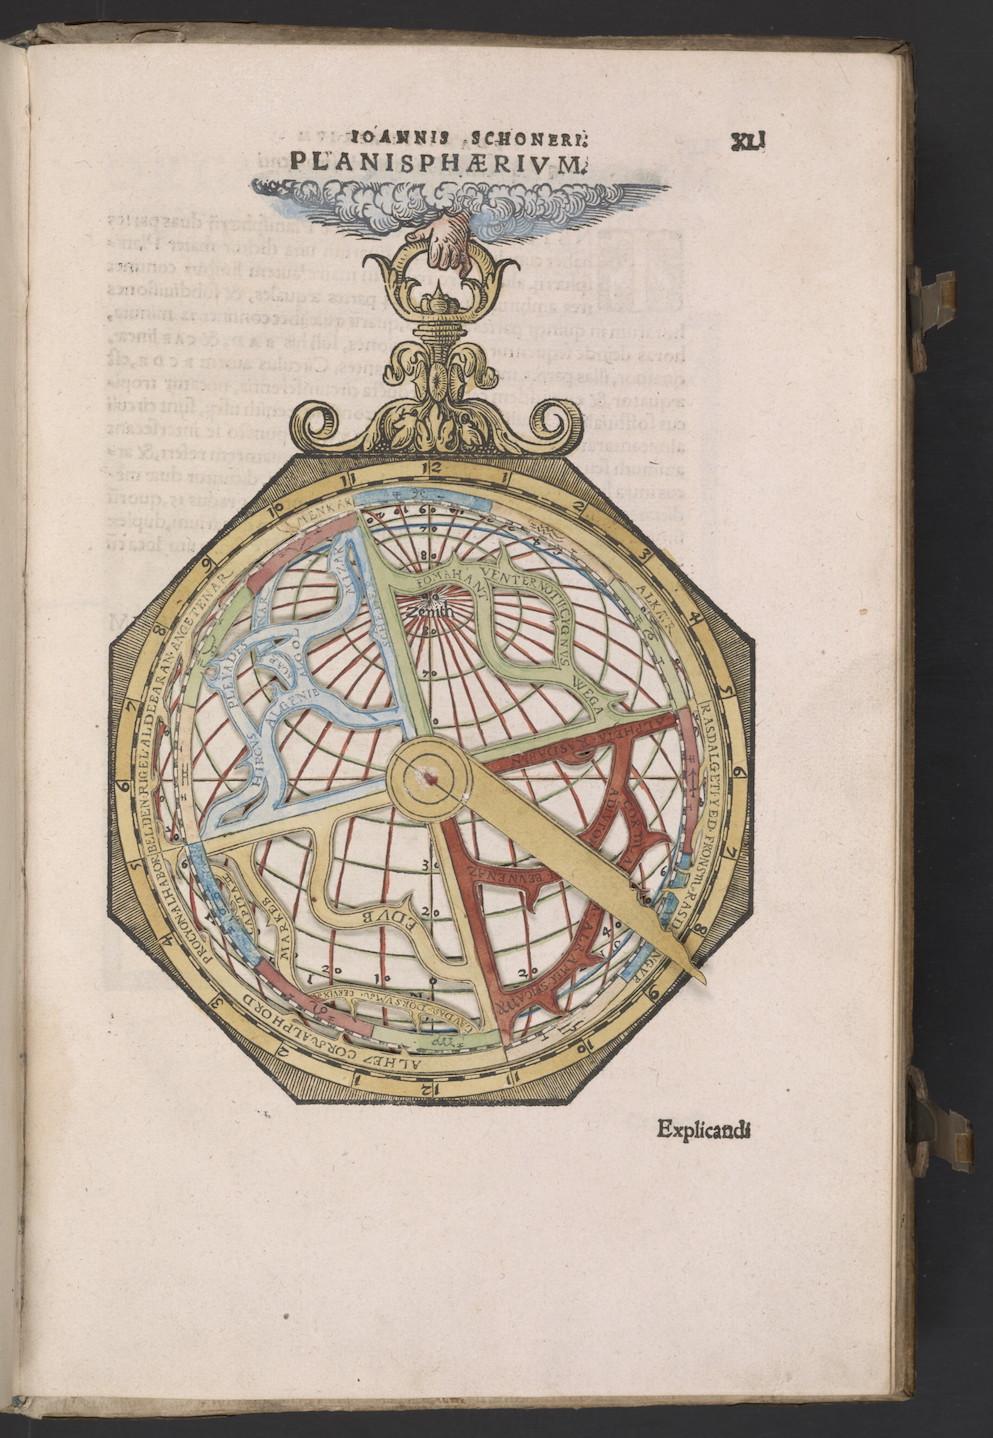 """Johannes Schöner, Opera mathematica (Nurnberg: in officina Ioannis Montani & Ulrici Neuber, 1551), c. 41r of the Planisphaerium, seu Metheoroscopium. Paper astrolabe."""